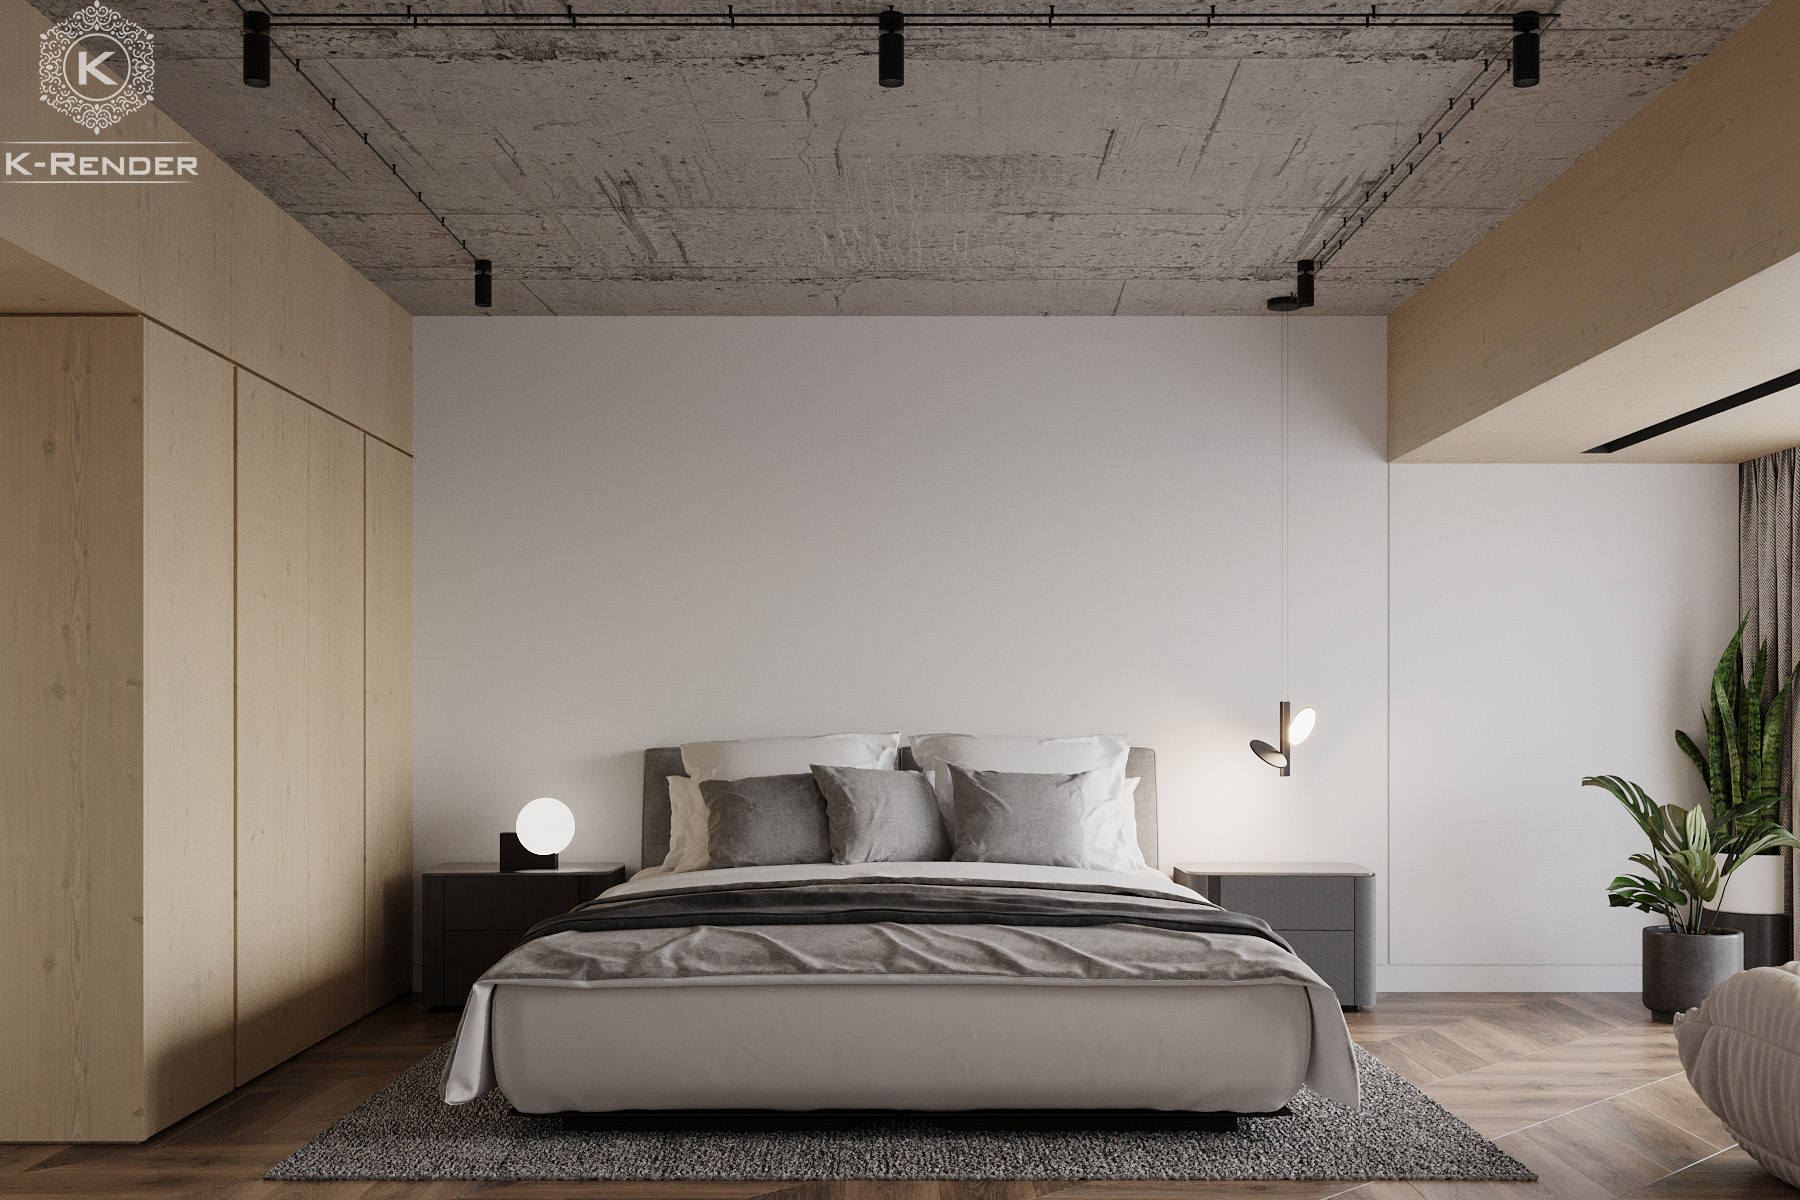 sunshine-apartment-k-render-studio-3d-rendering-studio-9